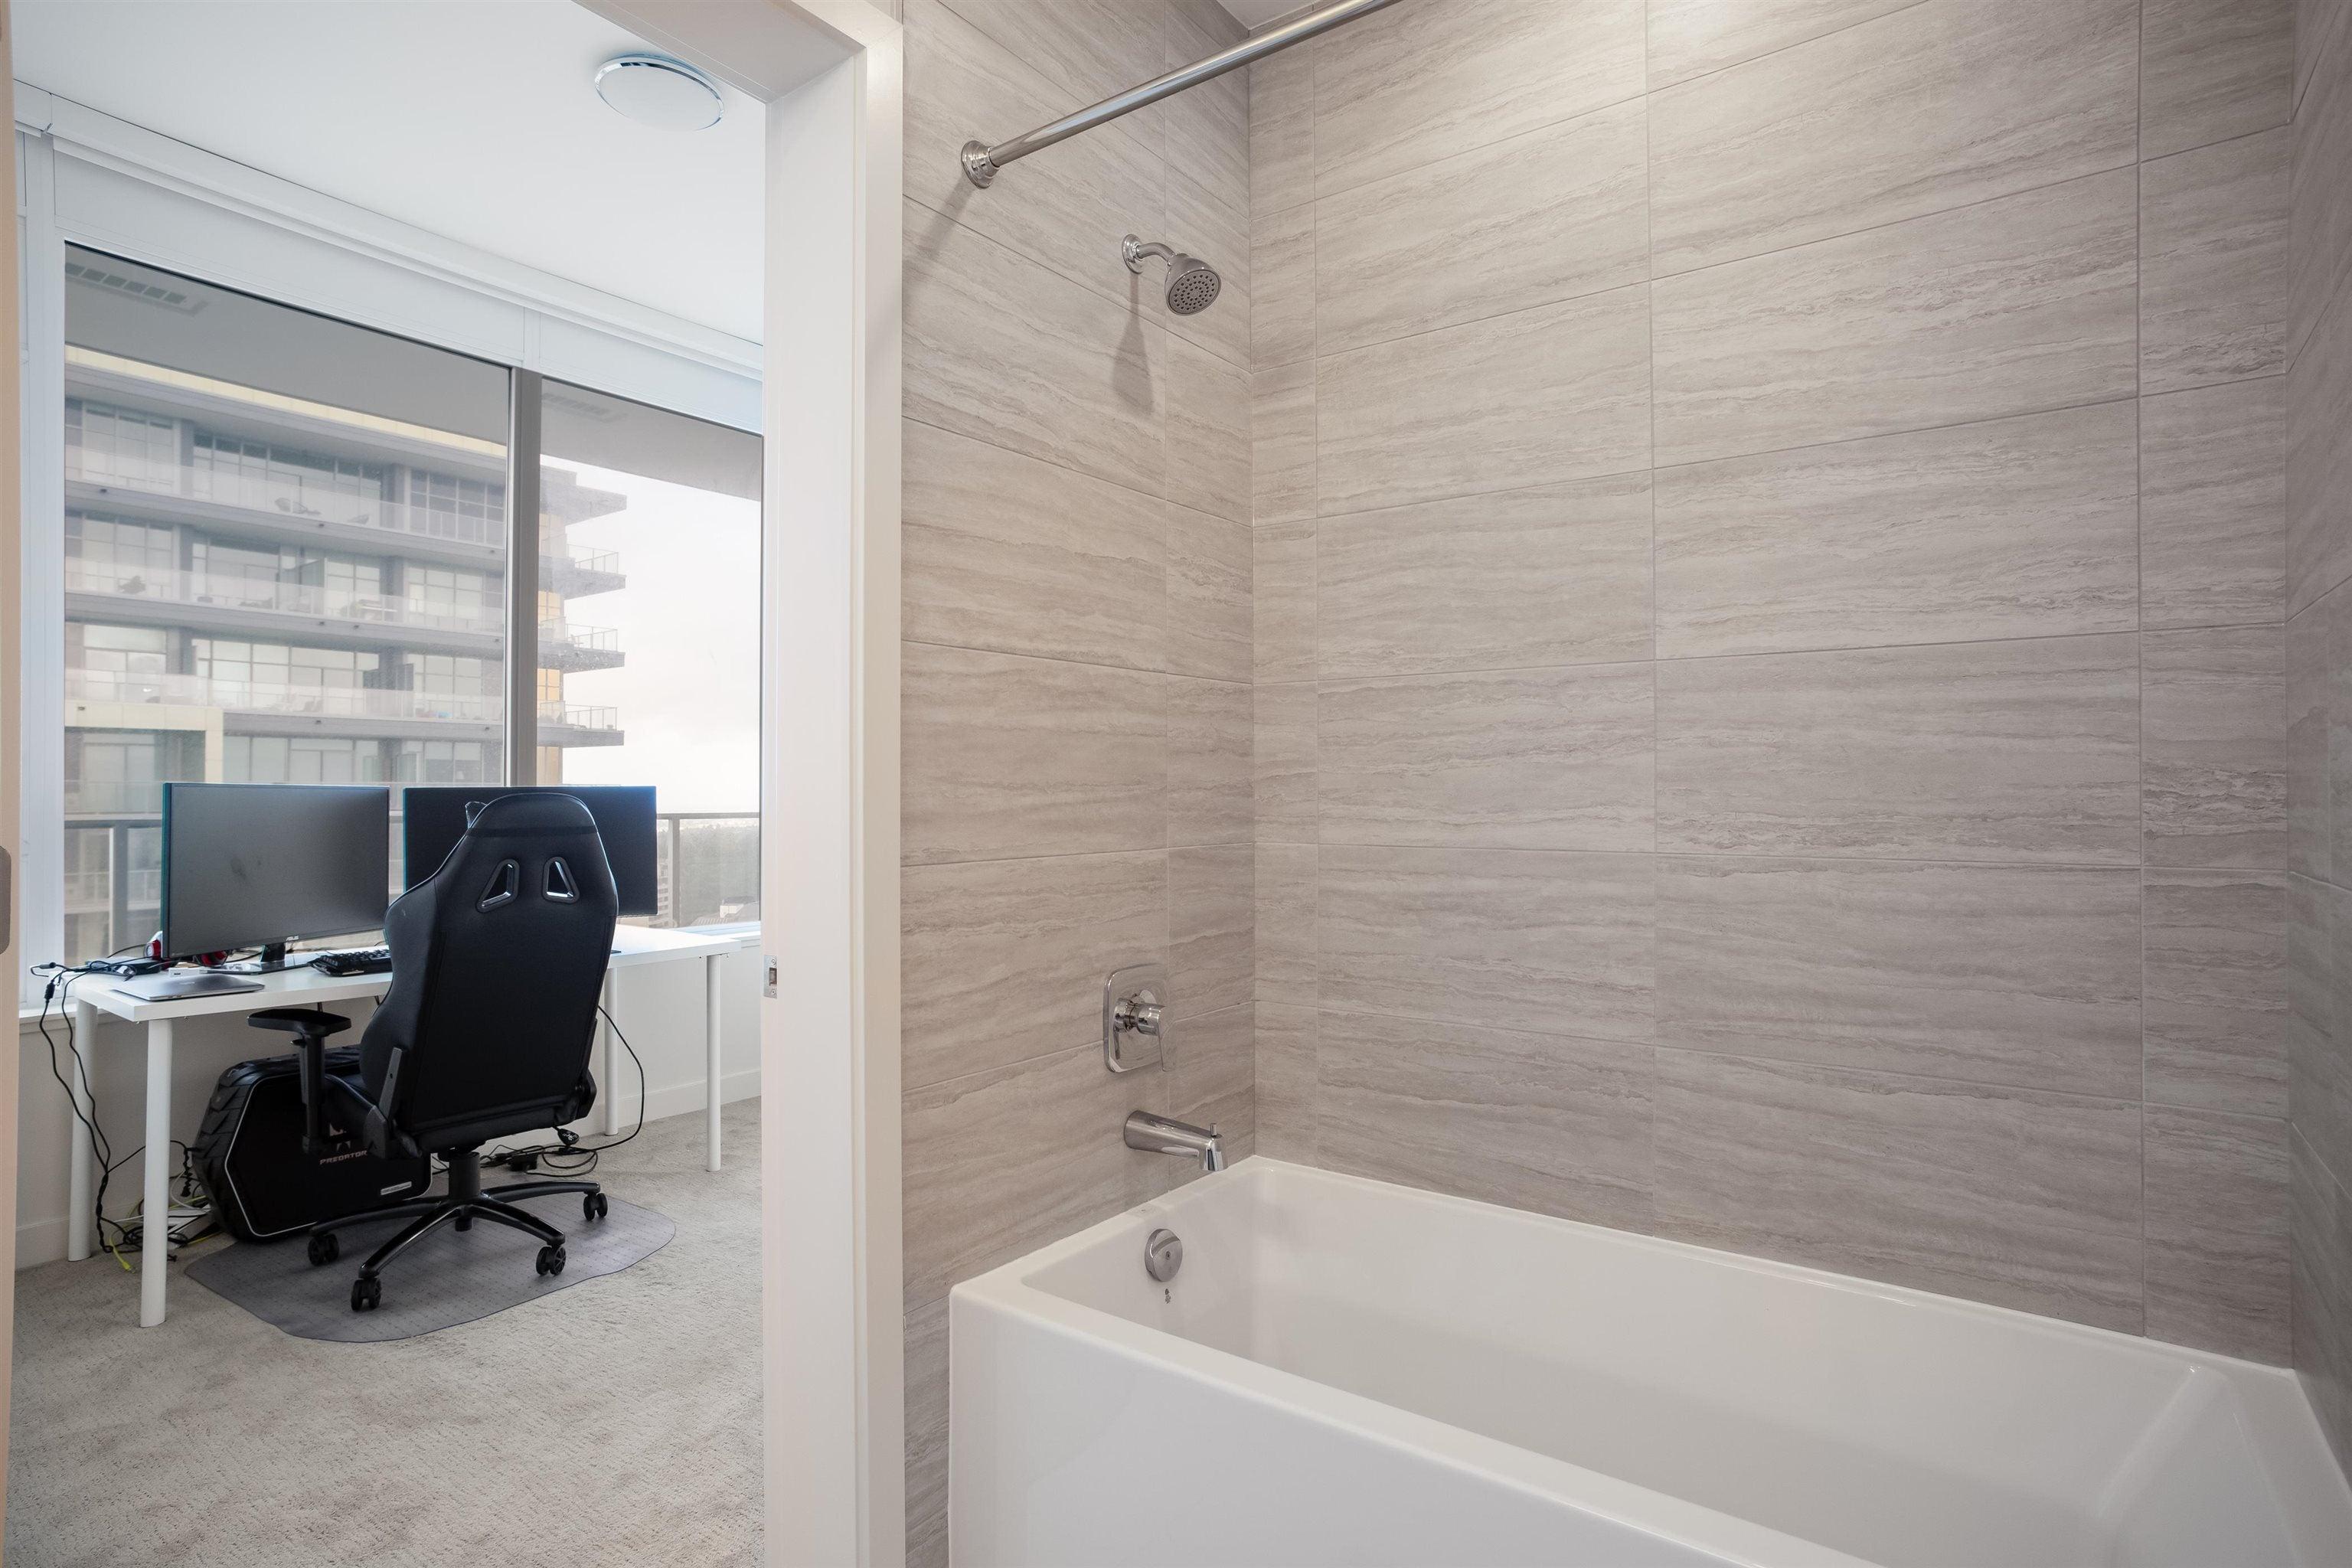 2206 6383 MCKAY AVENUE - Metrotown Apartment/Condo for sale, 2 Bedrooms (R2625647) - #19